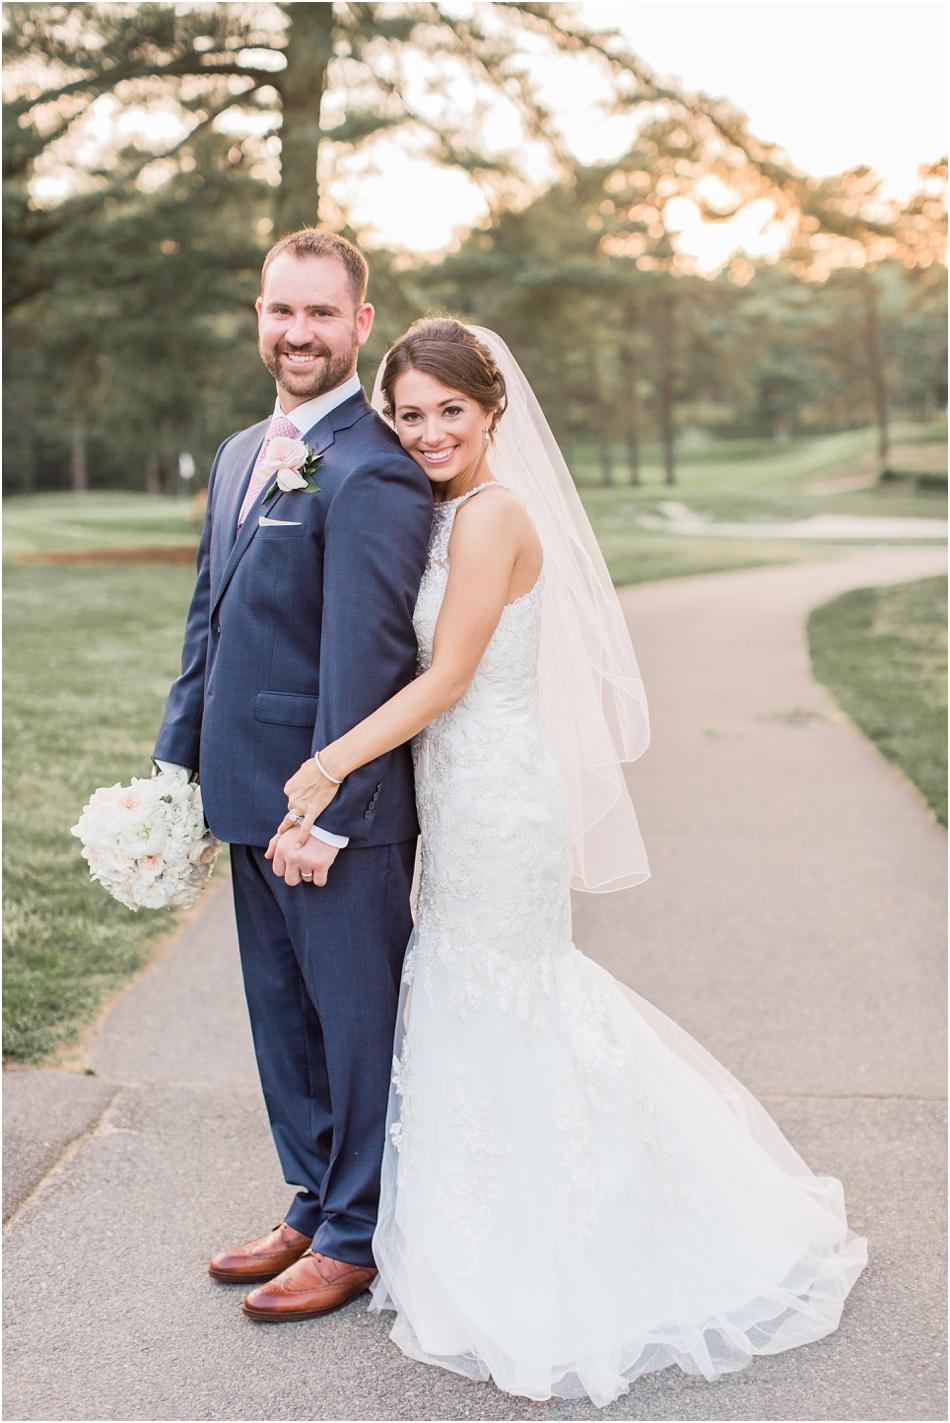 pine_hills_mirbeau_golf_club_boston_massachusetts_cape_cod_new_england_wedding_photographer_Meredith_Jane_Photography_photo_1723.jpg